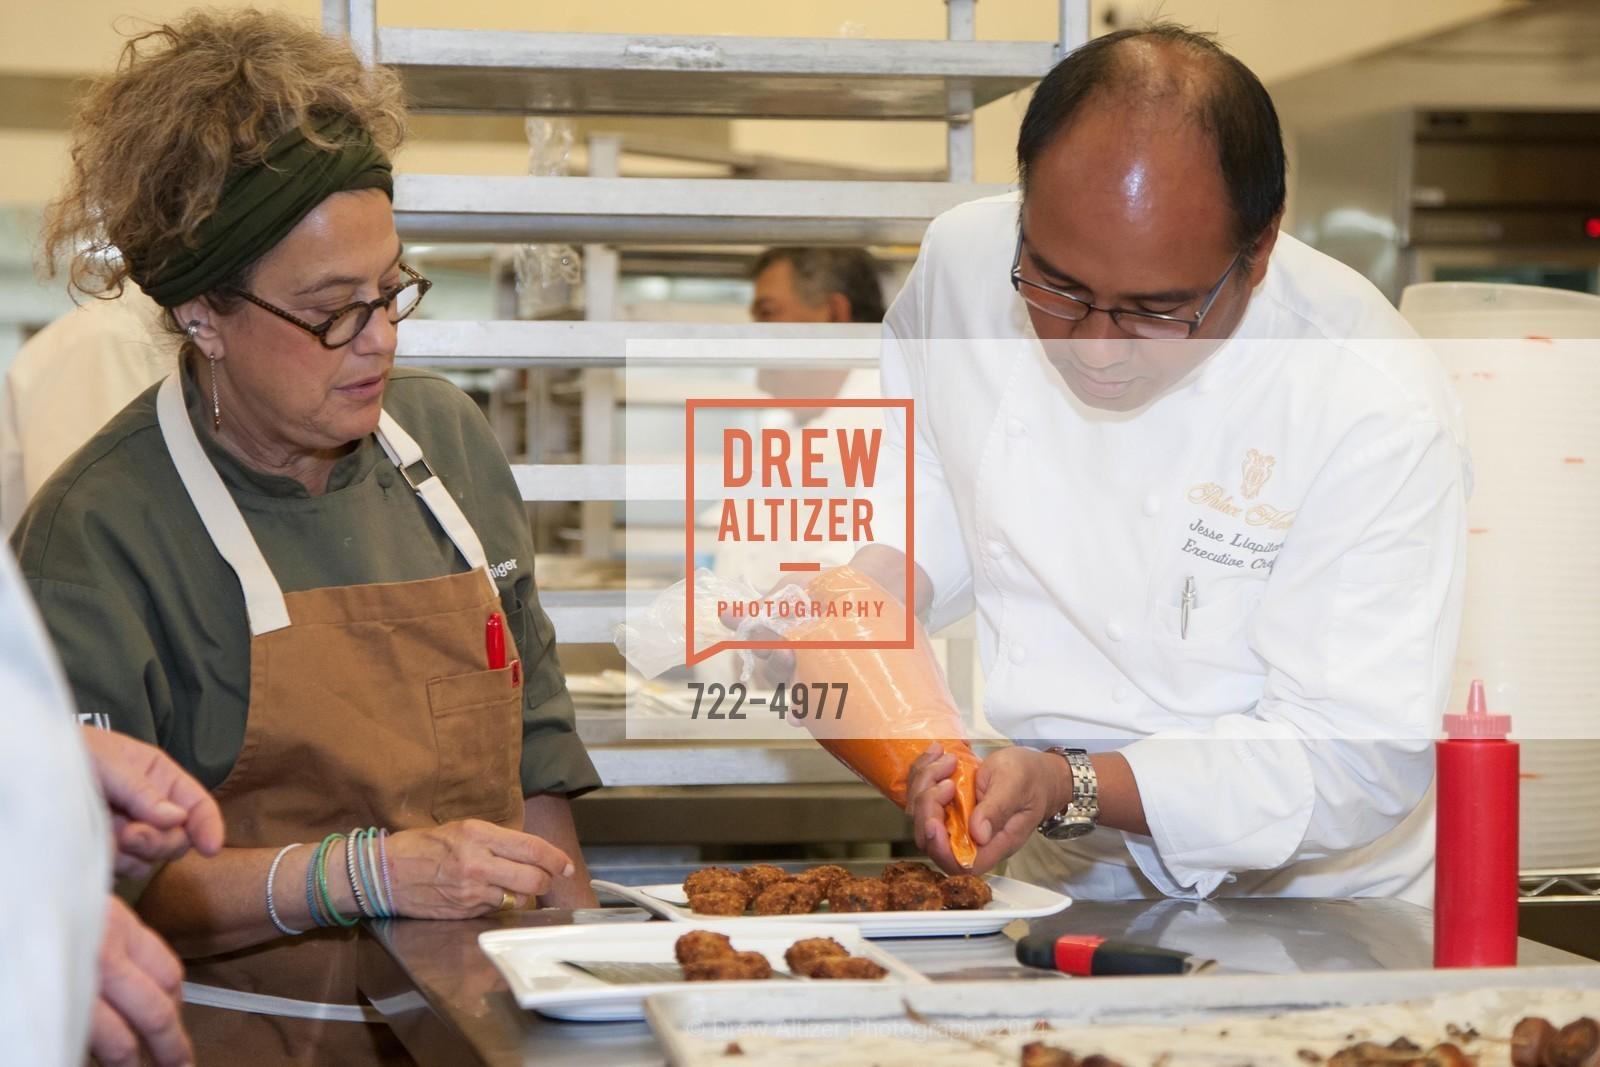 Susan Feniger, Executive Chef Jesse Llapitan, Photo #722-4977